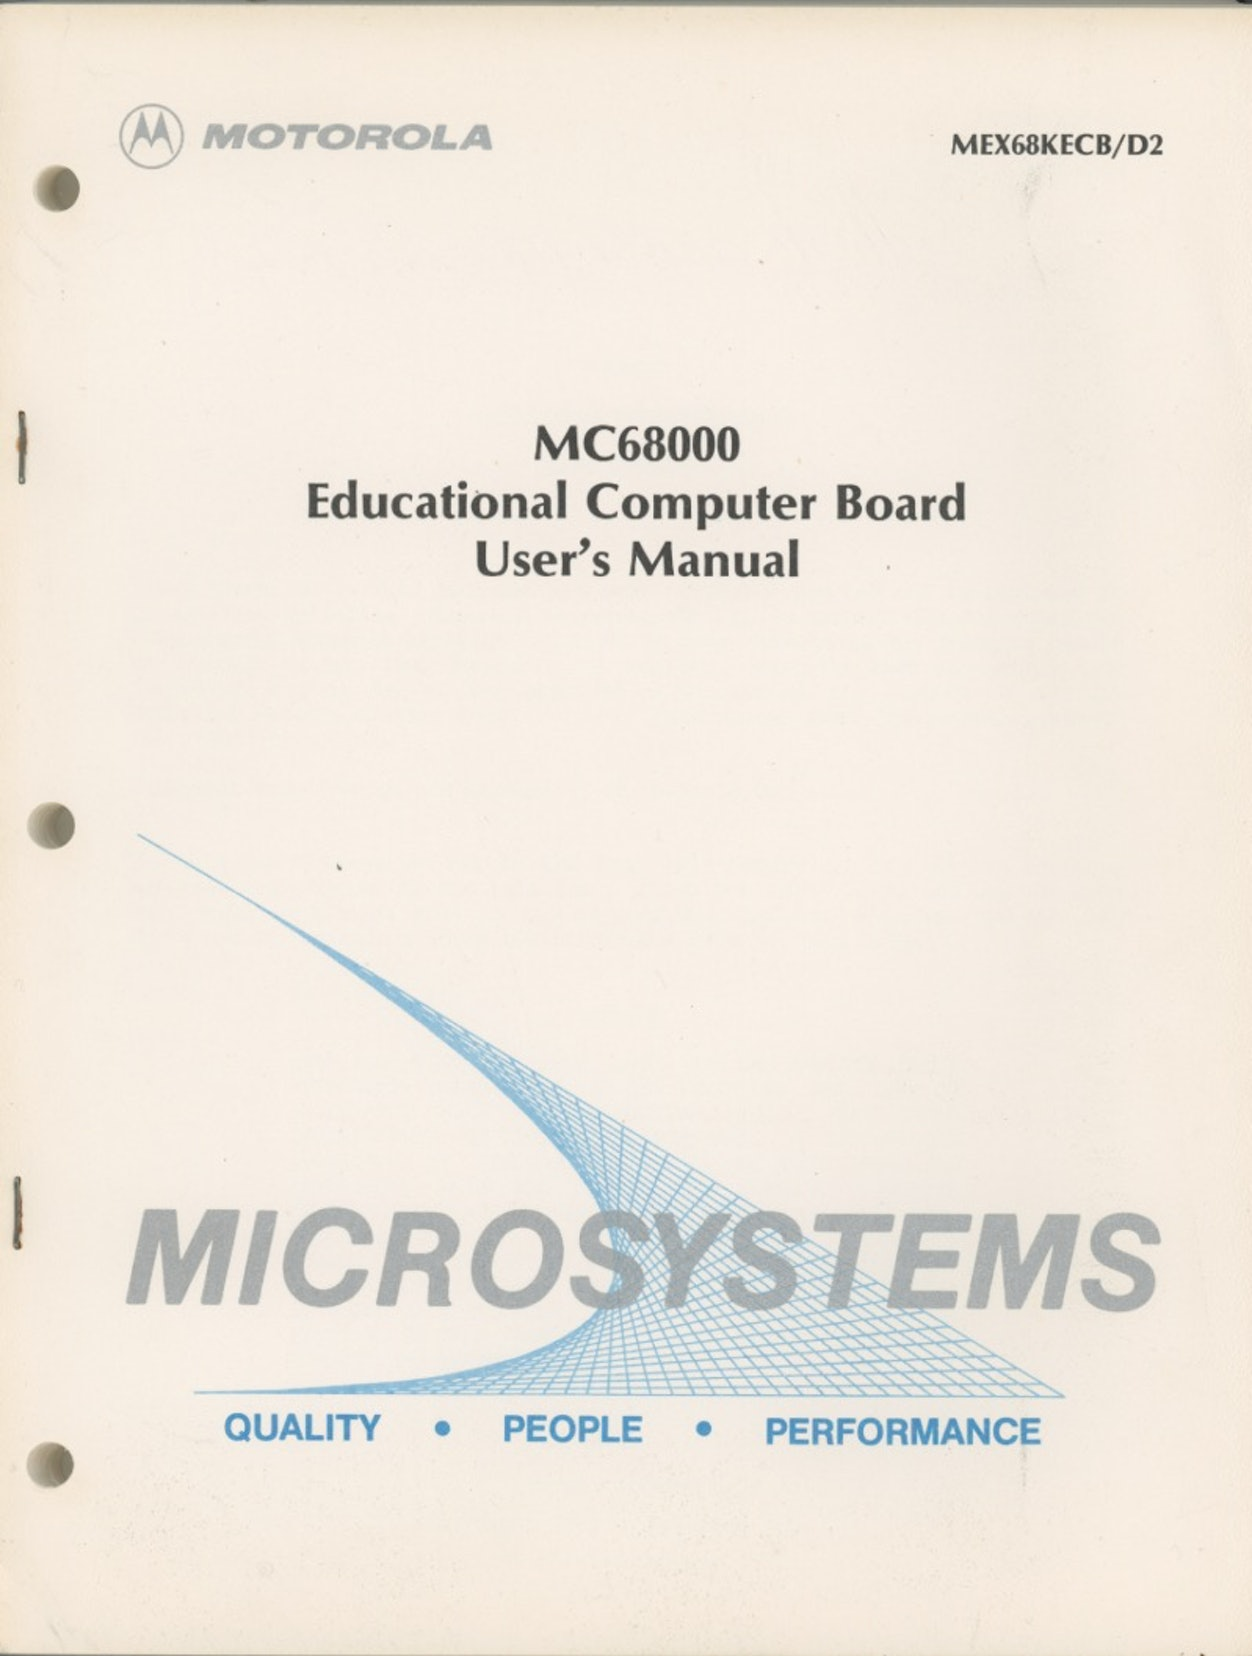 MC68000 Educational Computer Board User's Manual